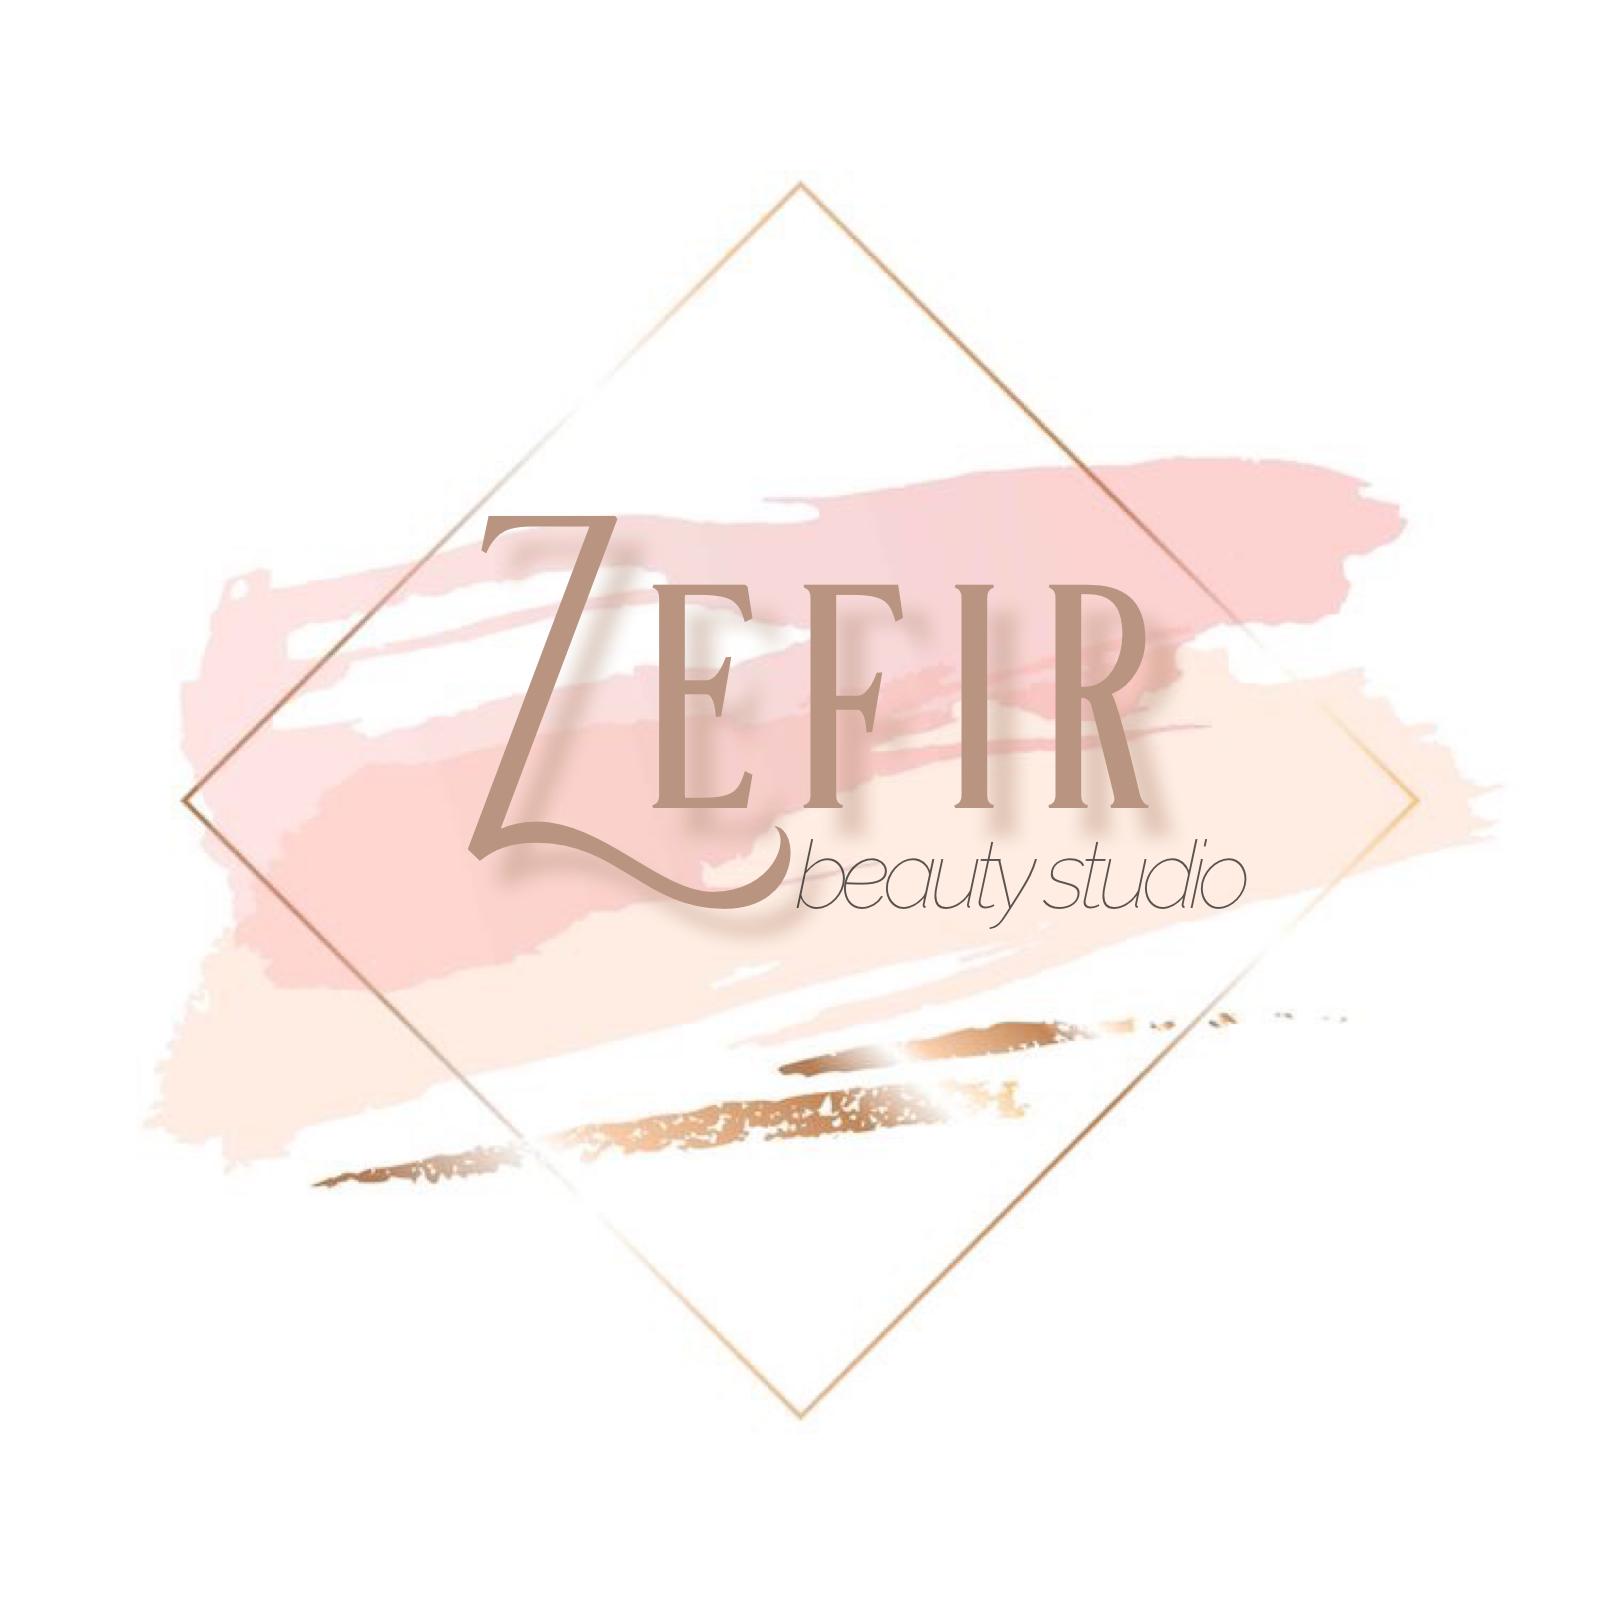 zefir.beautystudio